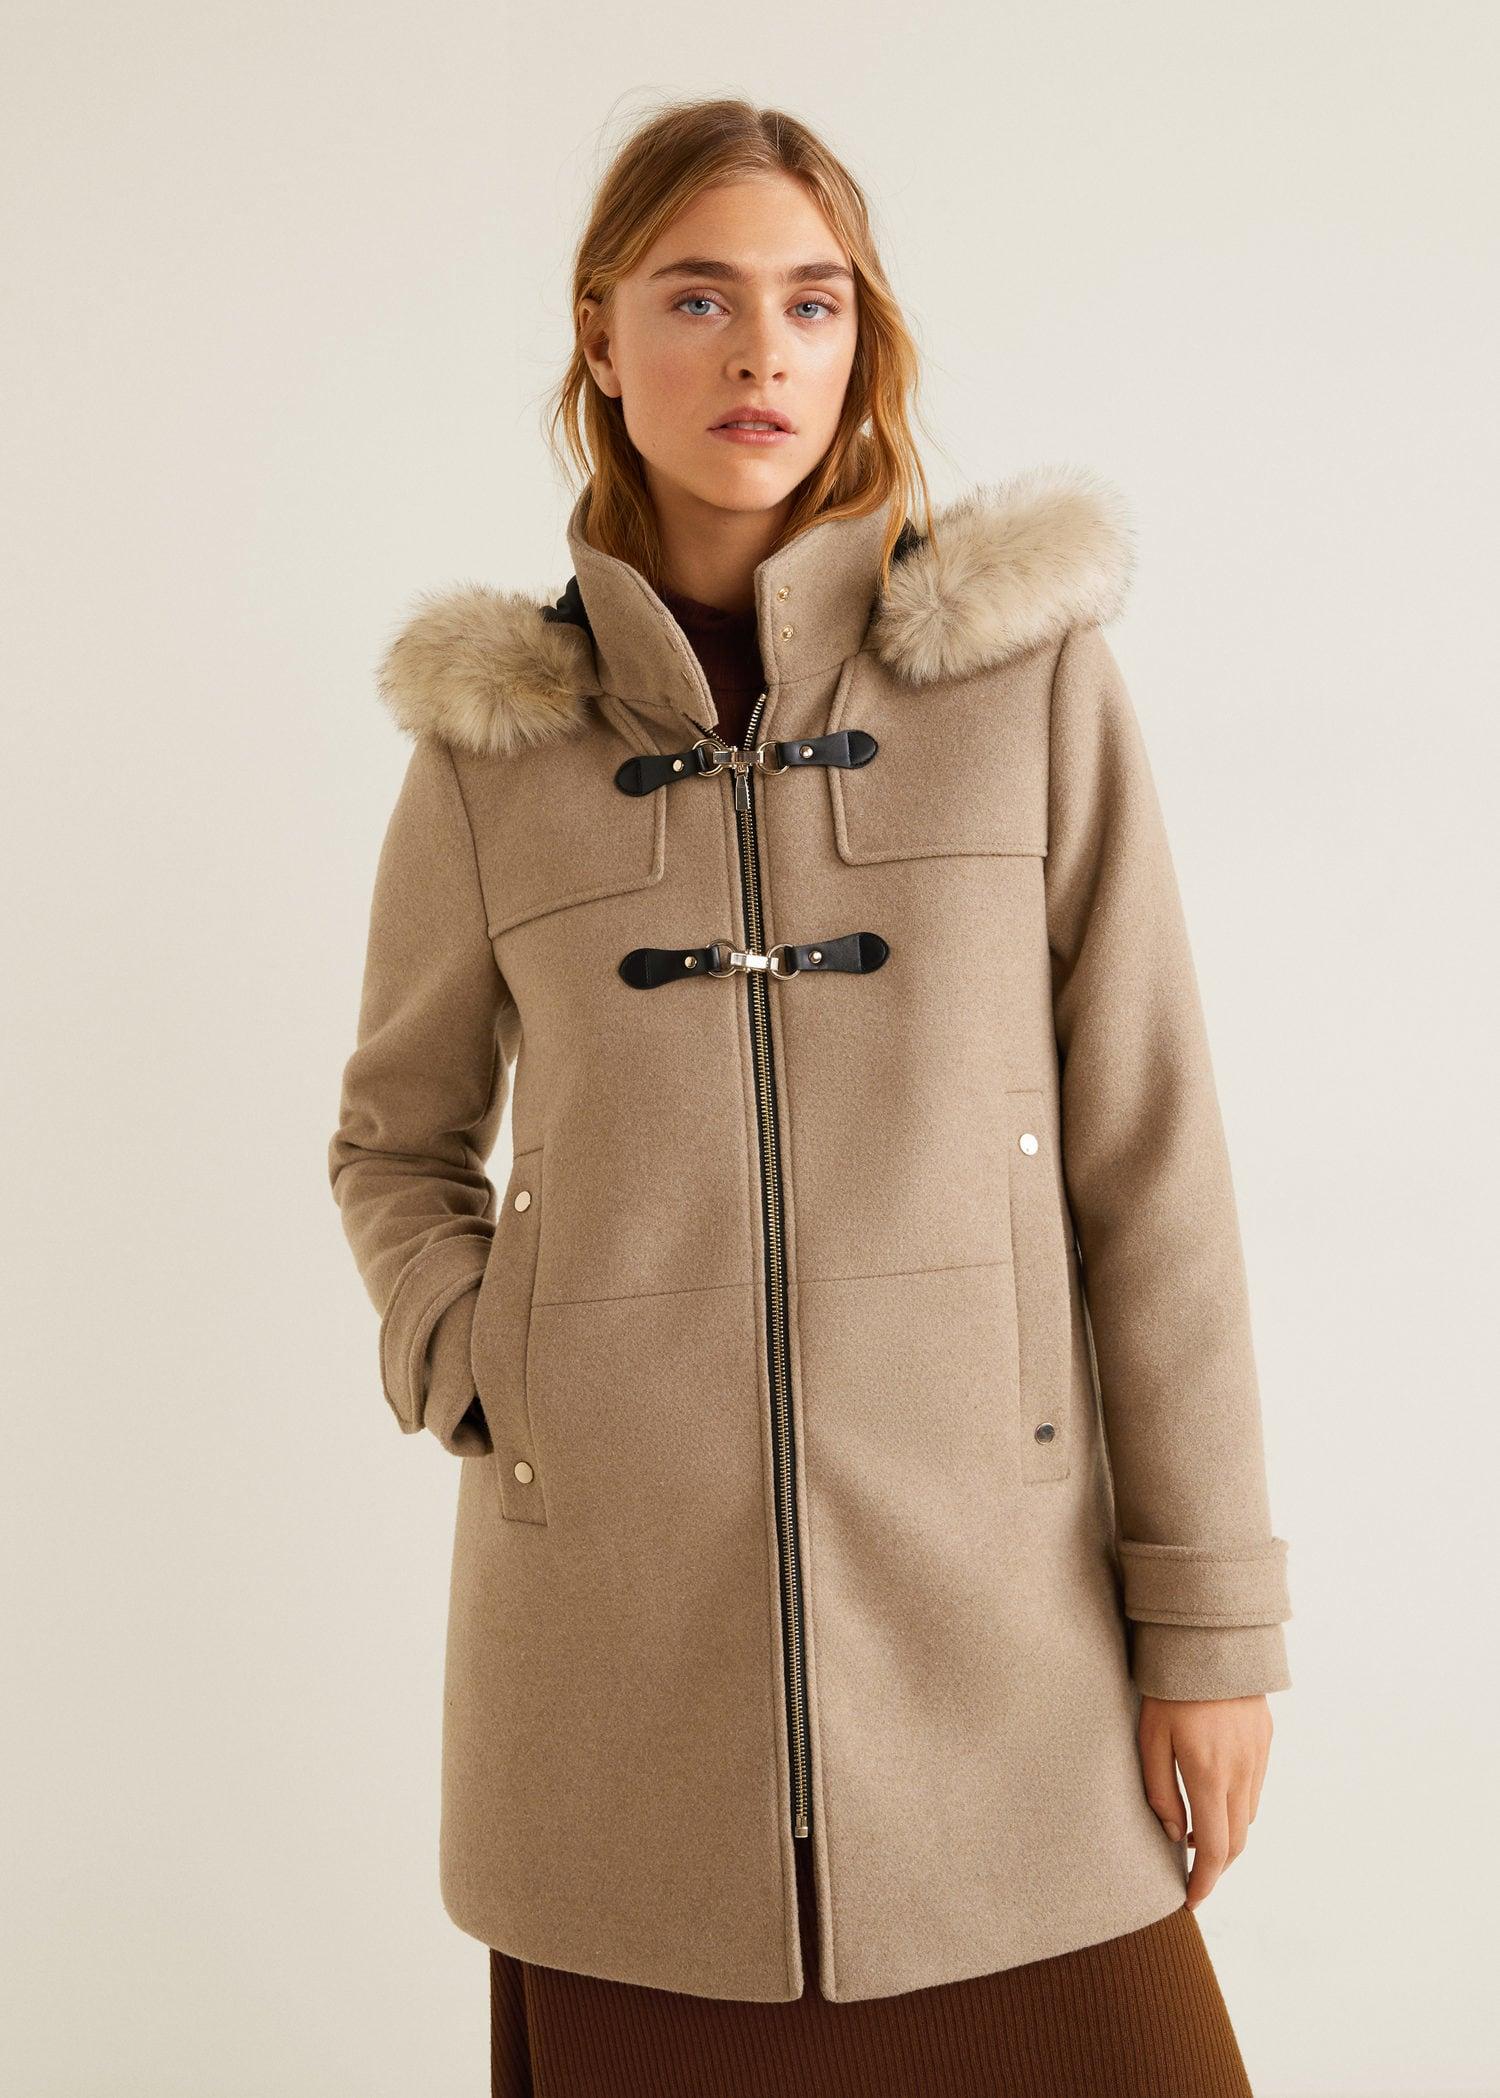 manteau femme beige capuche